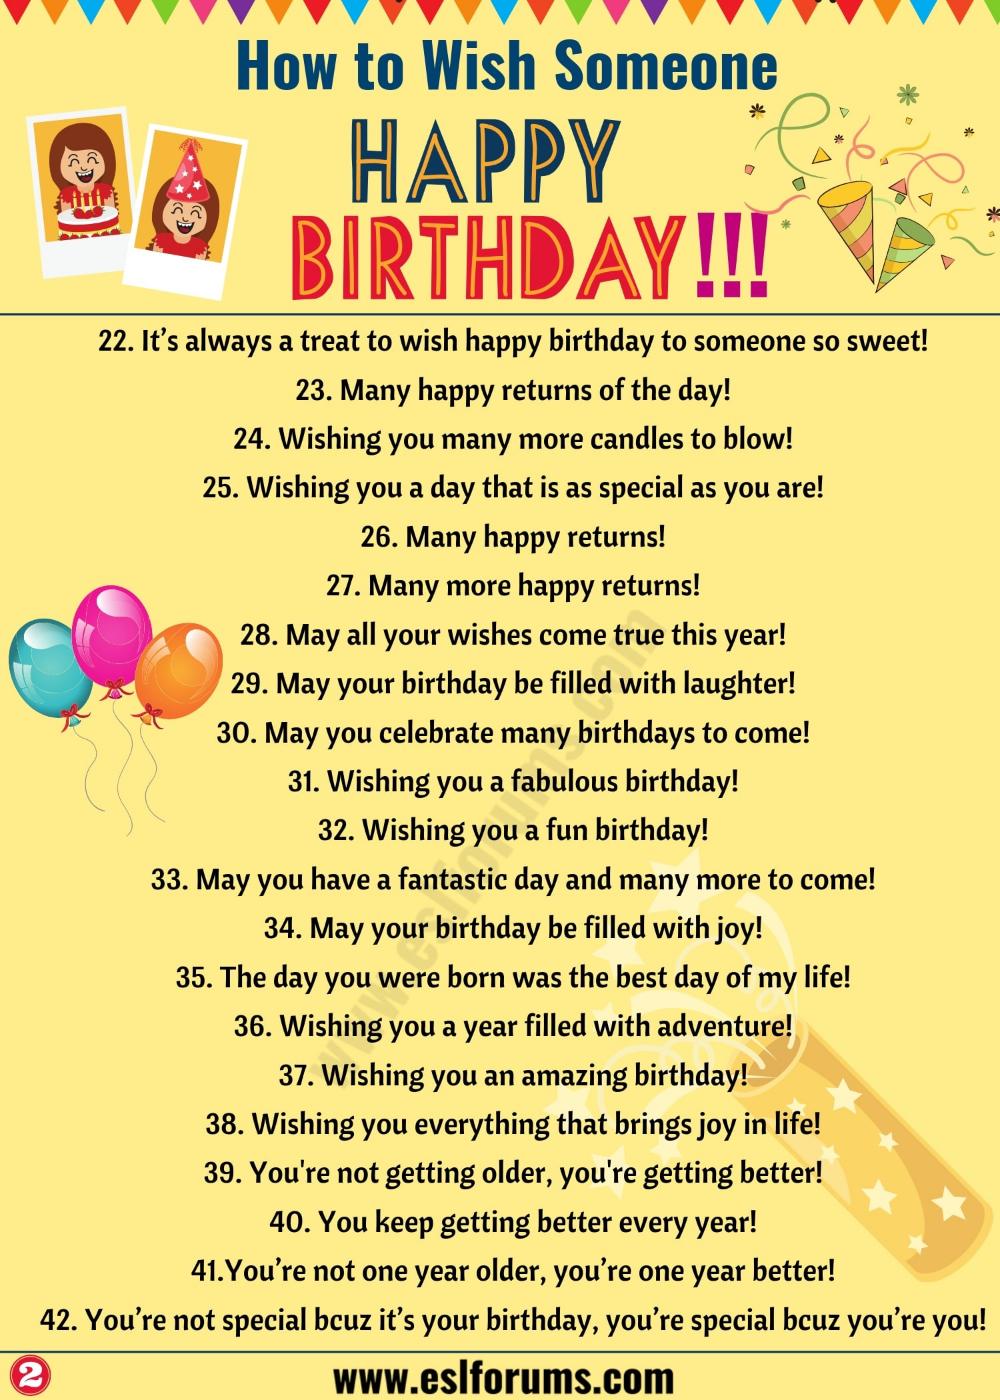 Birthday Wishes 40 Best Happy Birthday Wishes To Friends Others Esl Forums Happy Birthday Wishes Quotes Happy Birthday Fun Birthday Wishes Quotes